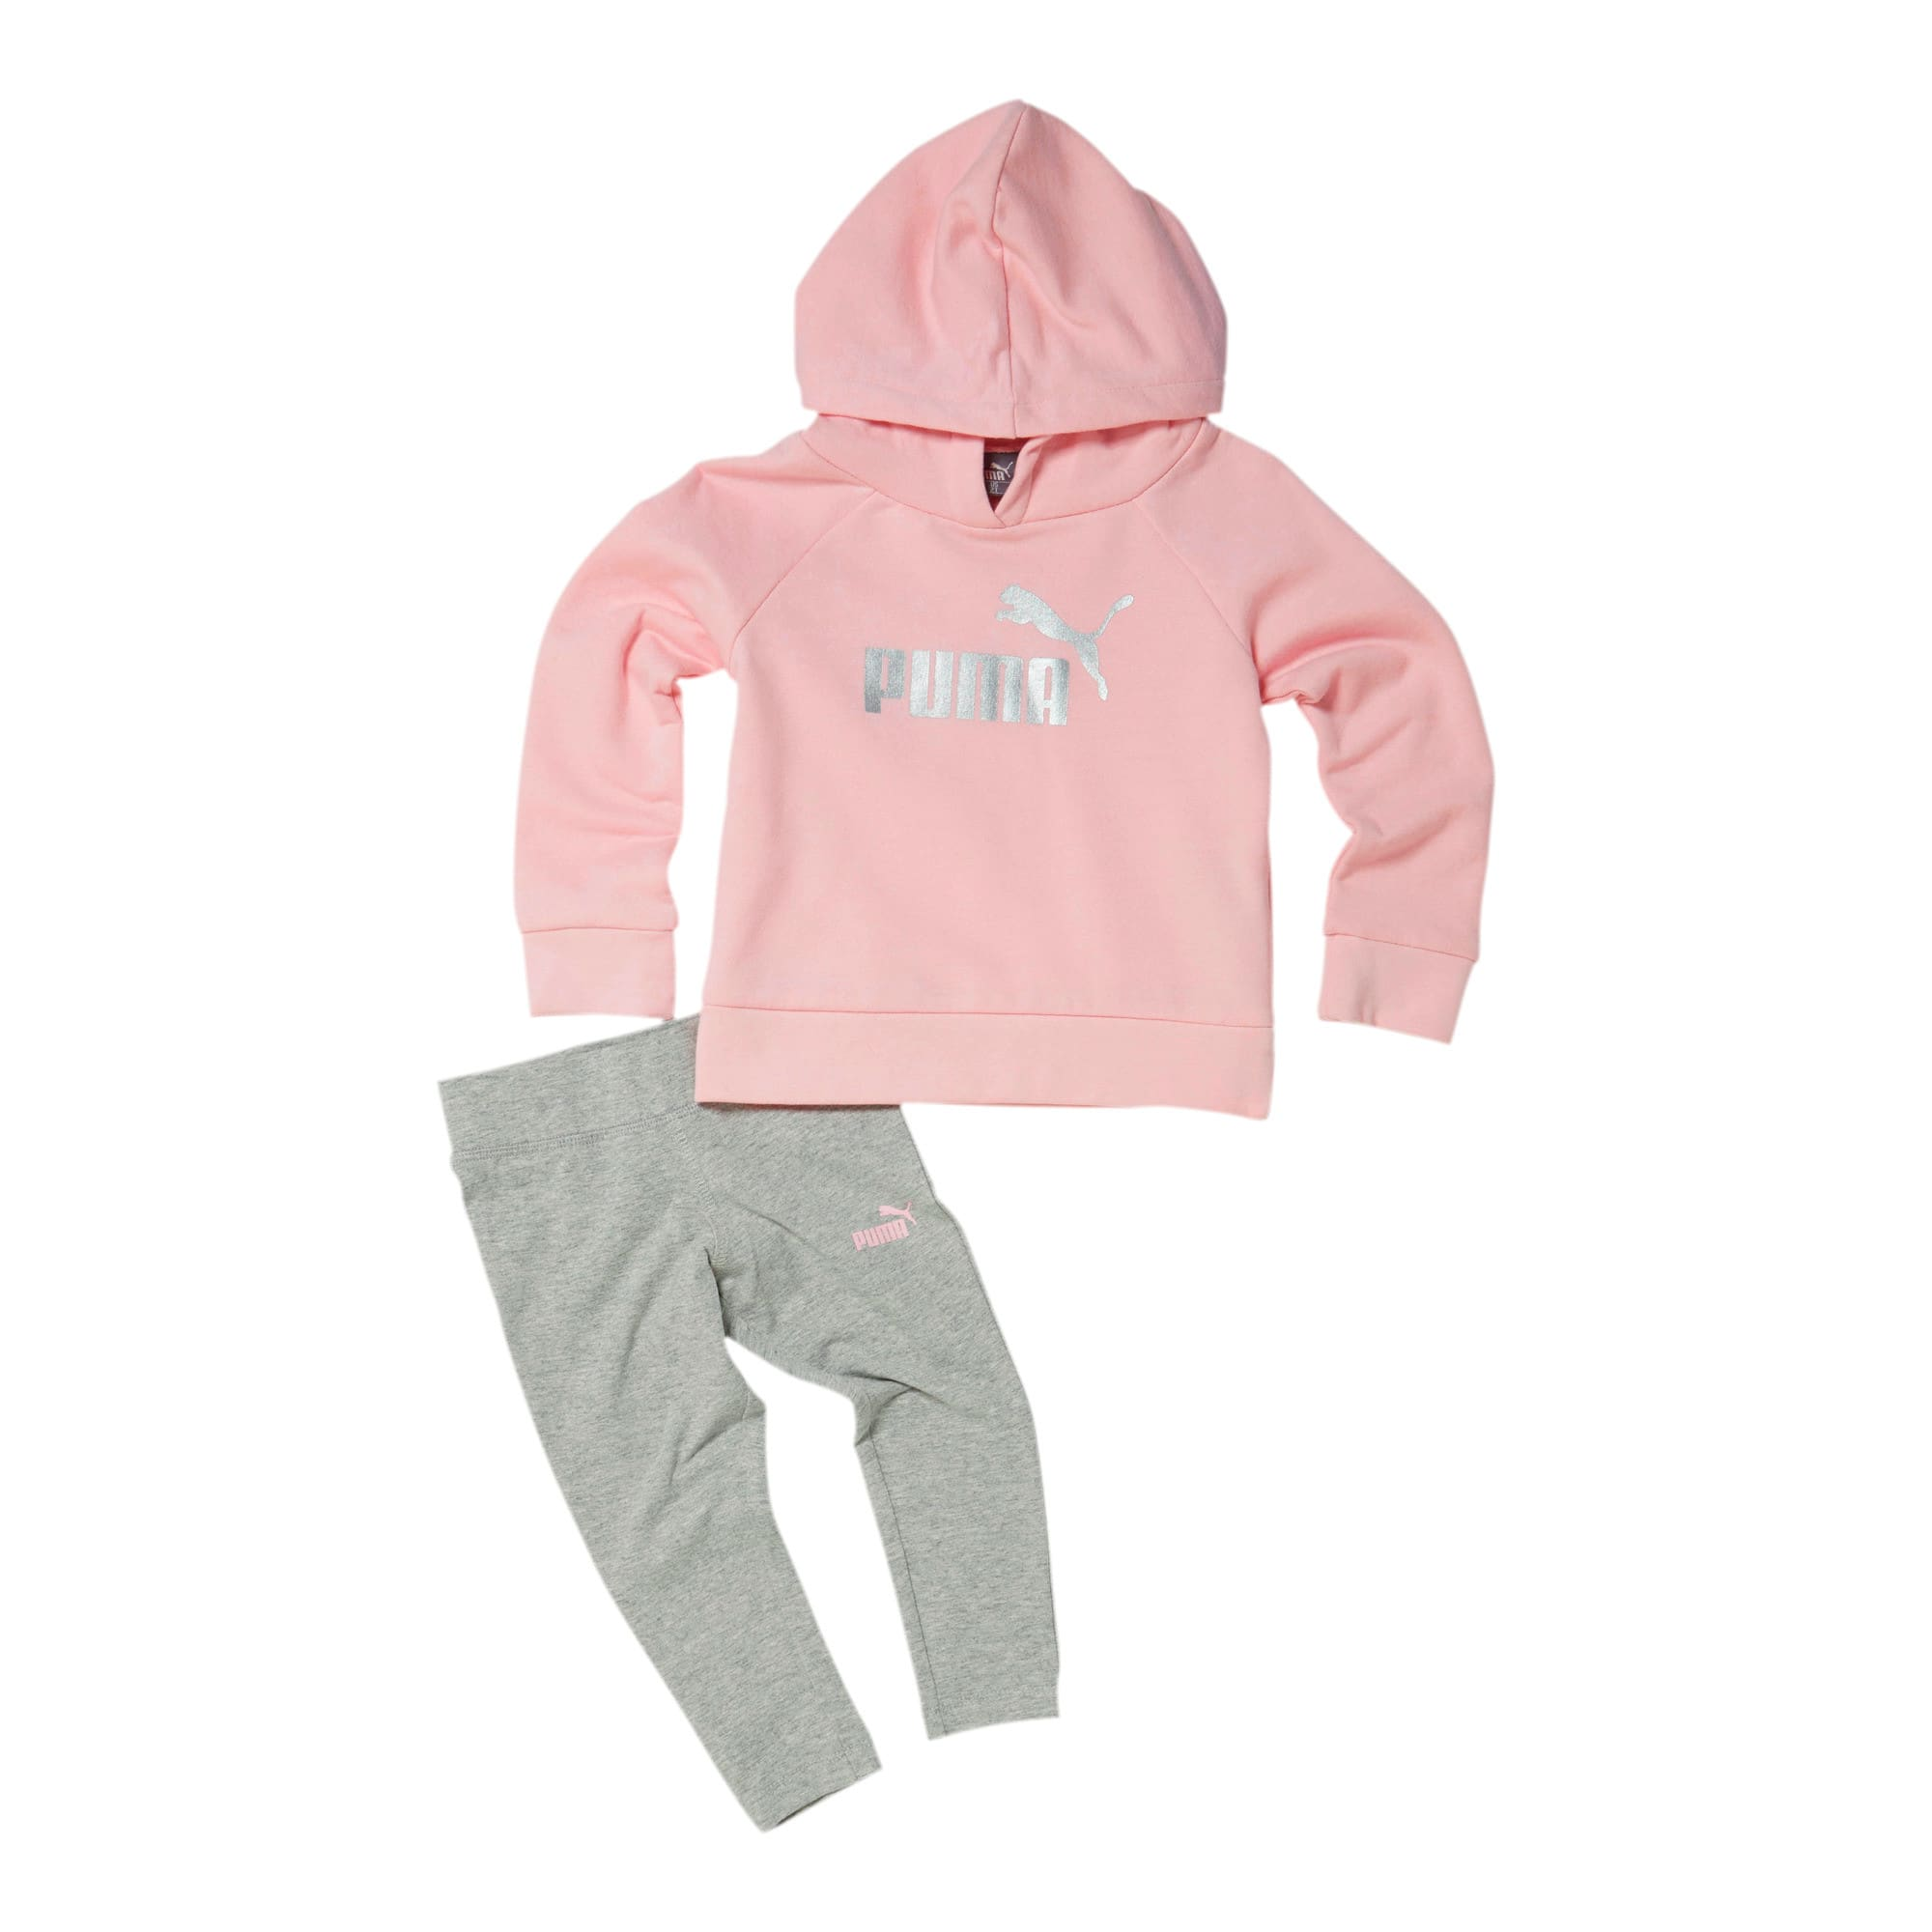 Thumbnail 1 of Toddler Fleece Pullover and Legging Set, CRYSTAL ROSE, medium